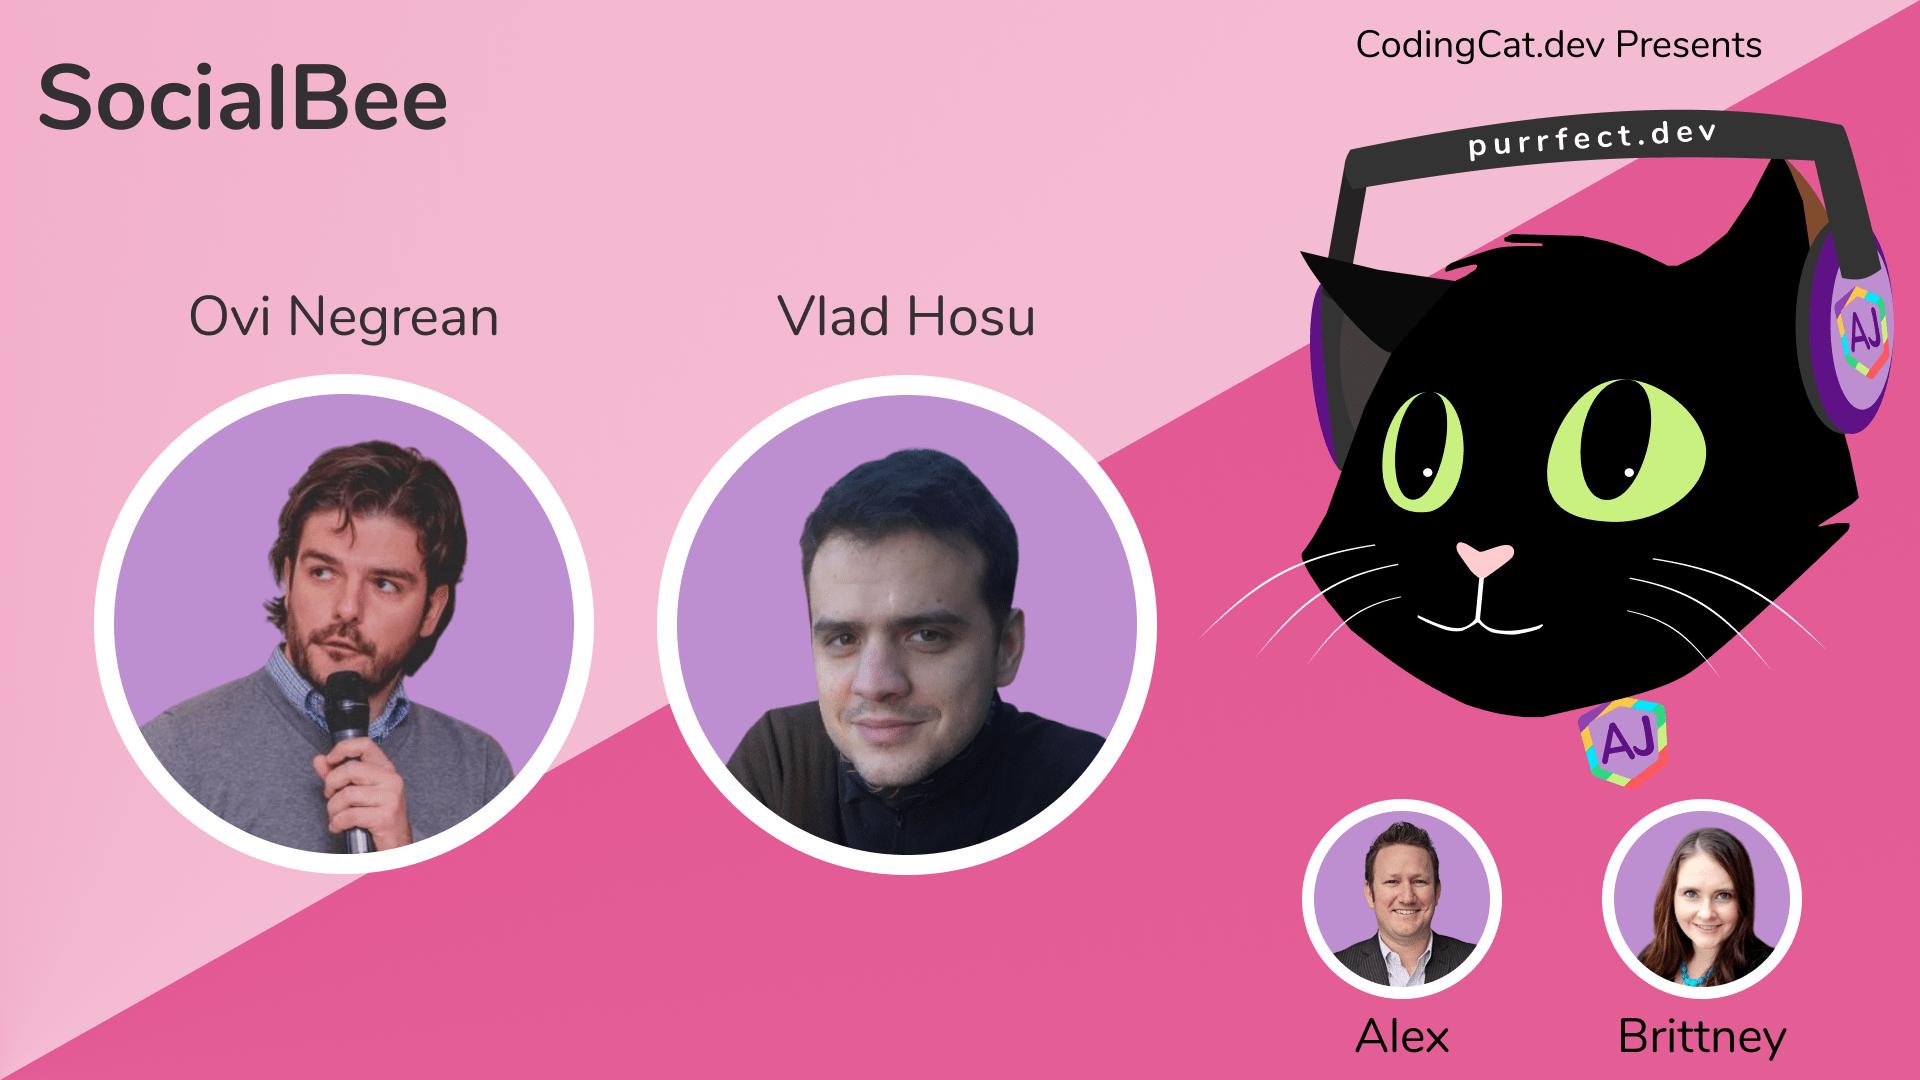 1.7 - SocialBee with Ovi Negrean and Vlad Hosu